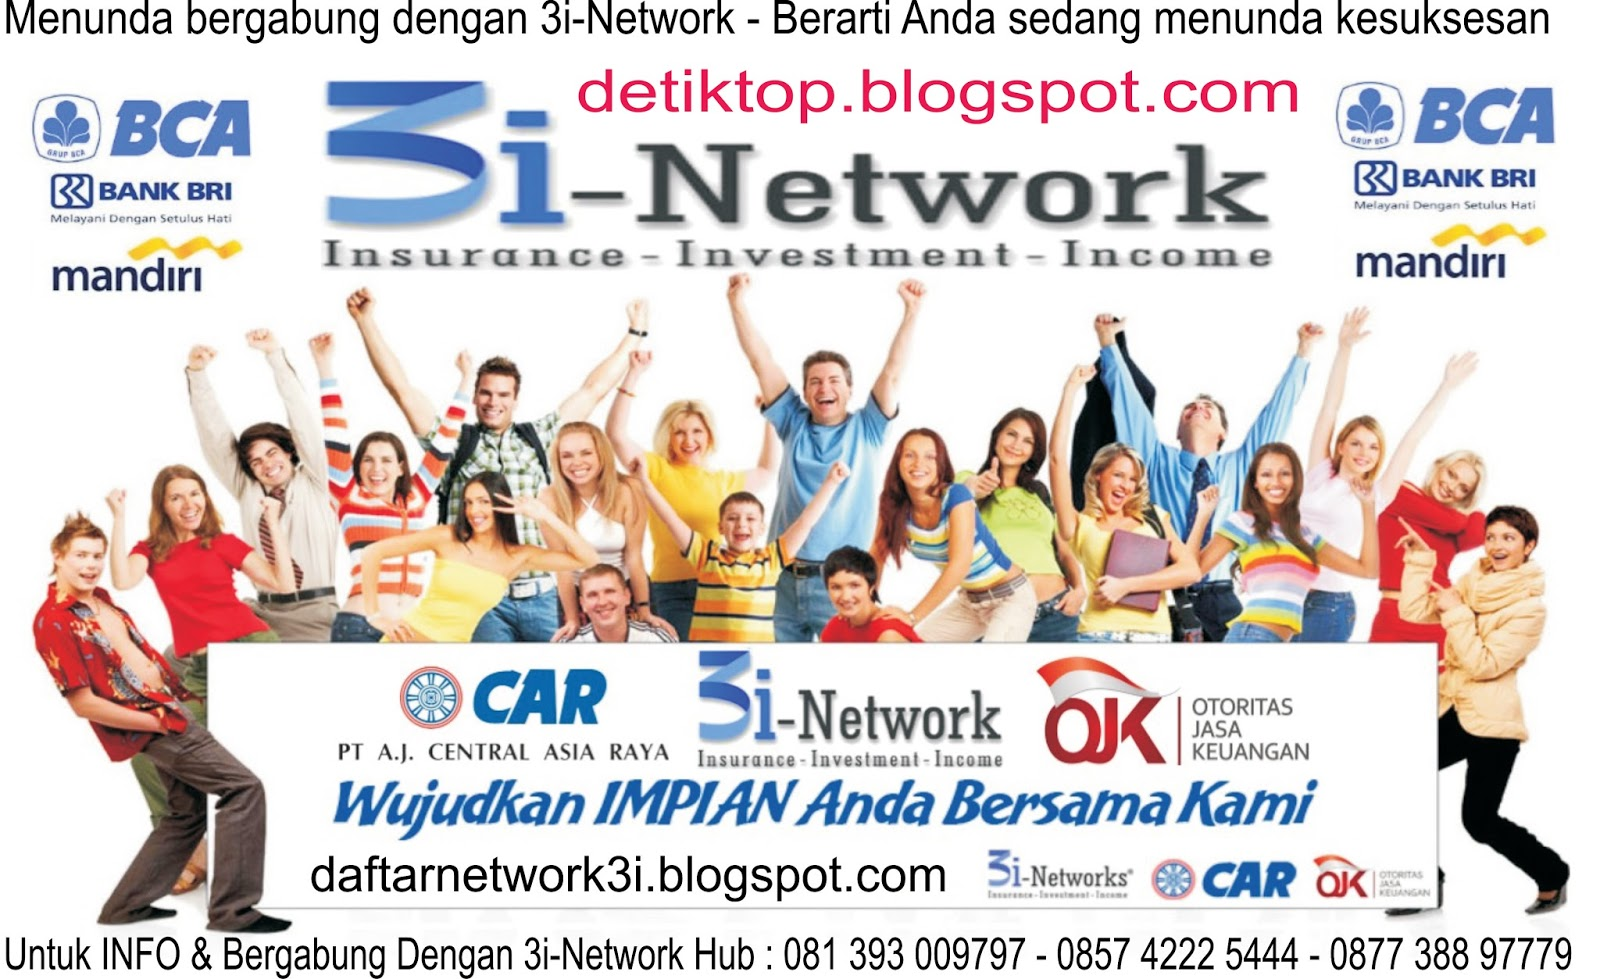 Agen Baja Ringan Di Denpasar Bengkel, Montir, Teknisi, Komputer, Elektro, Pcb, Ac ...